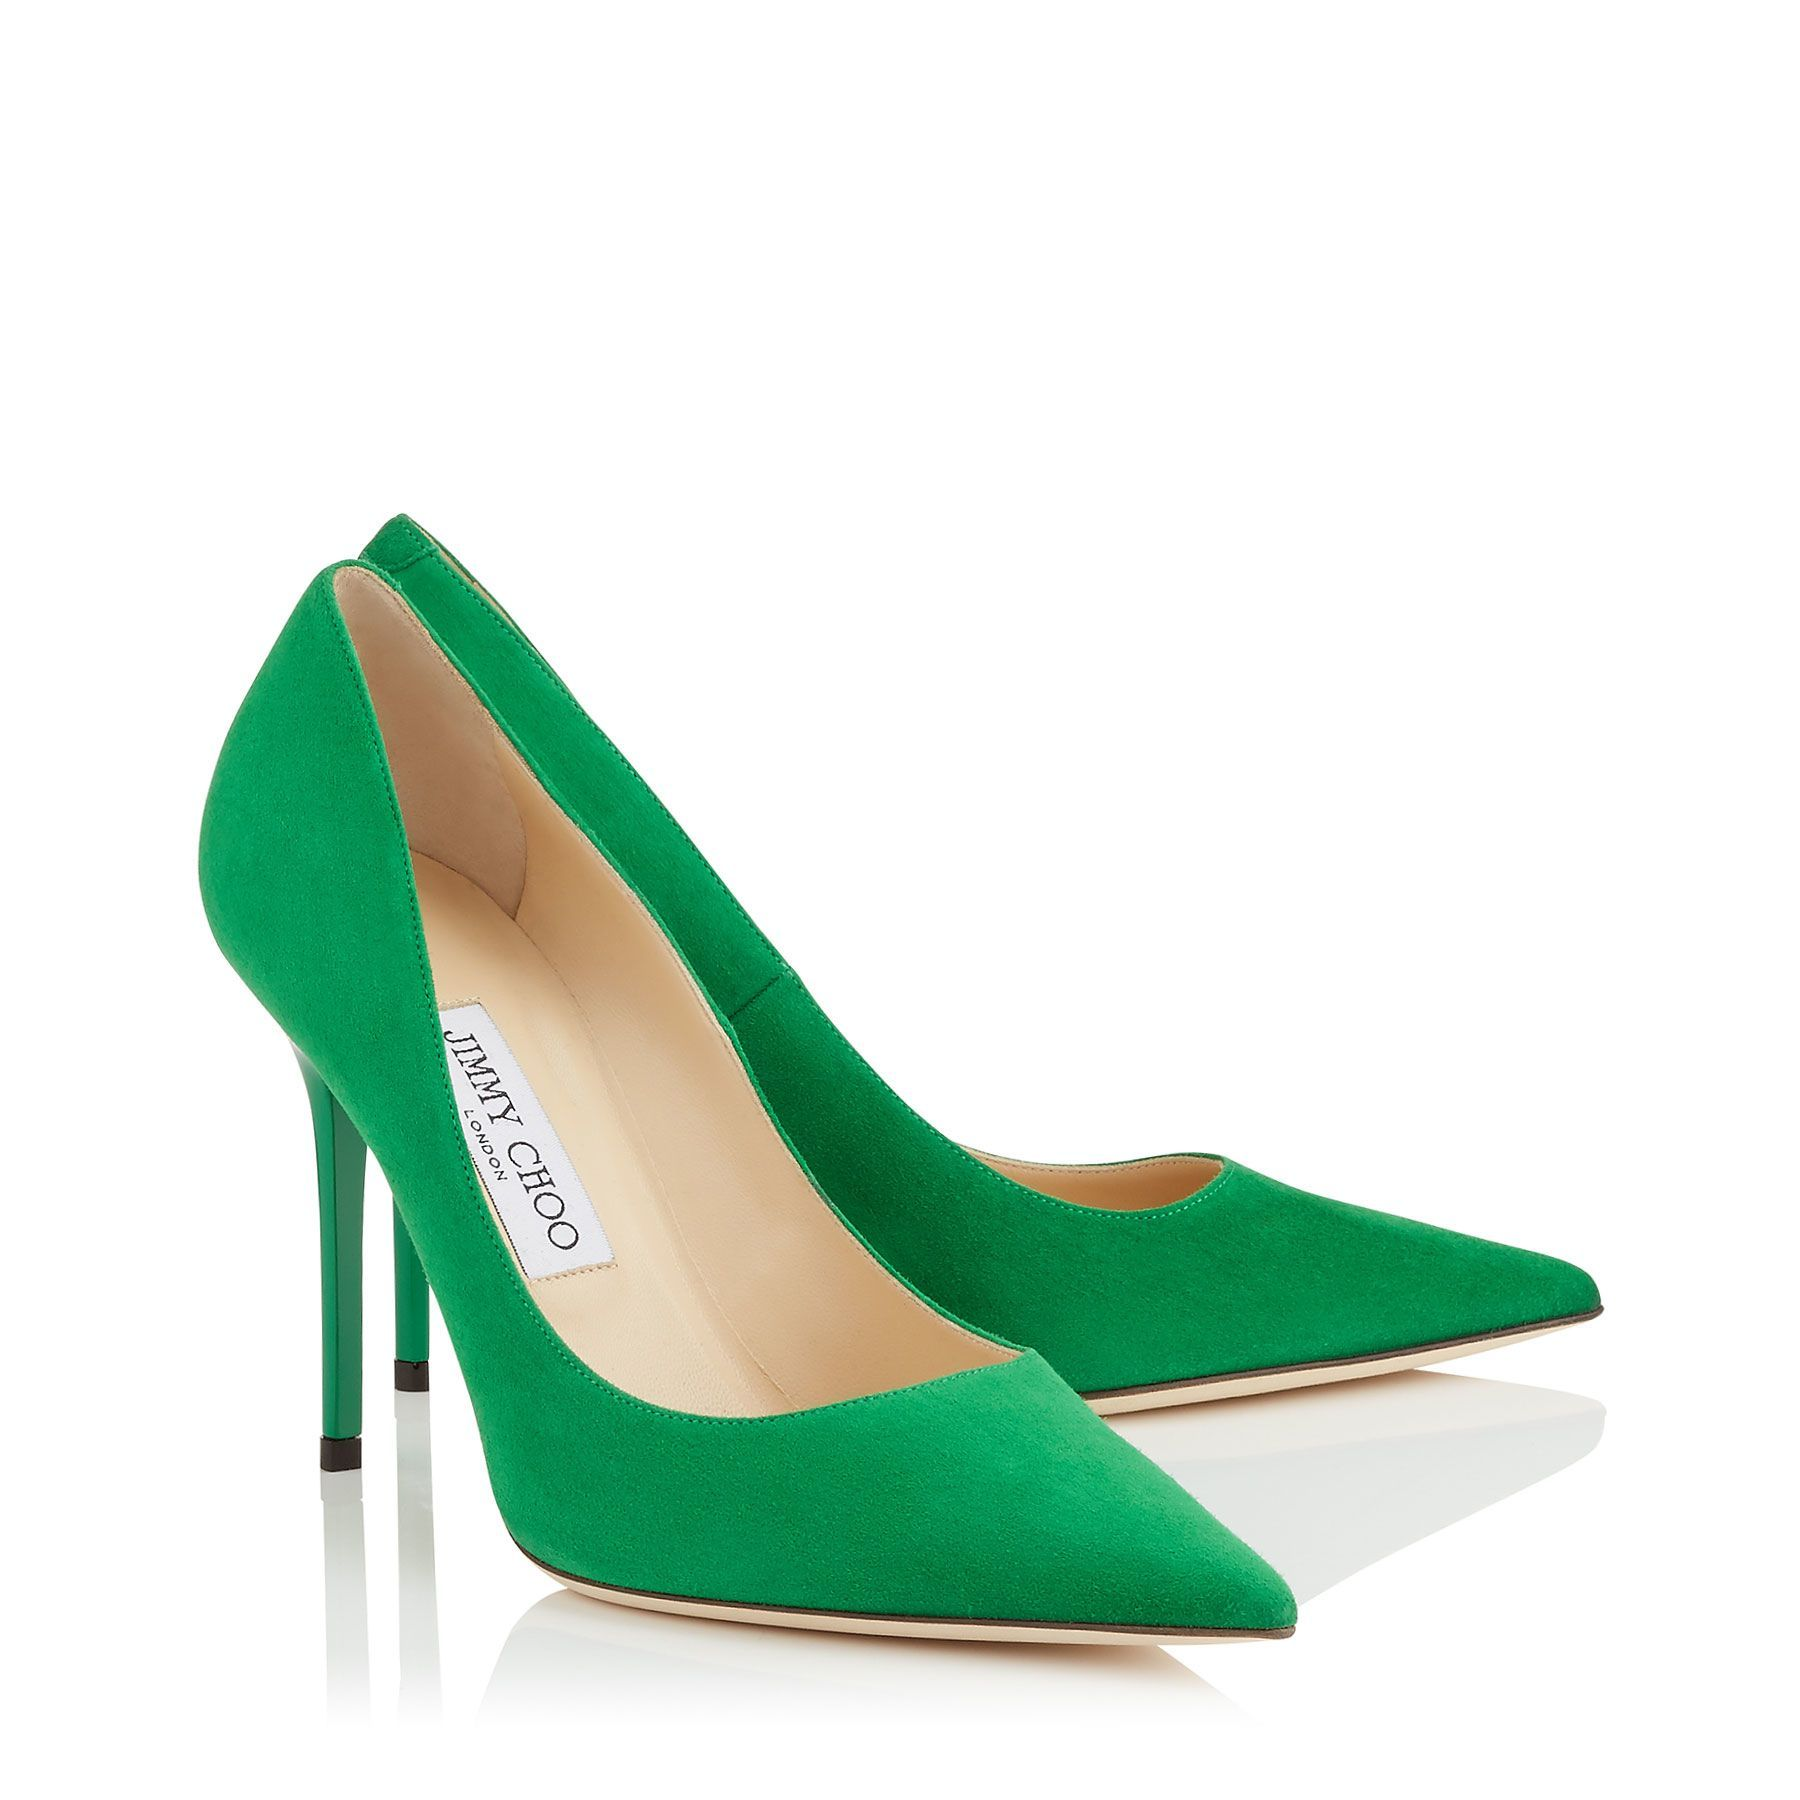 Kew Suede Pointy Toe Pumps | Abel | Pre Fall 15 | JIMMY CHOO Shoes